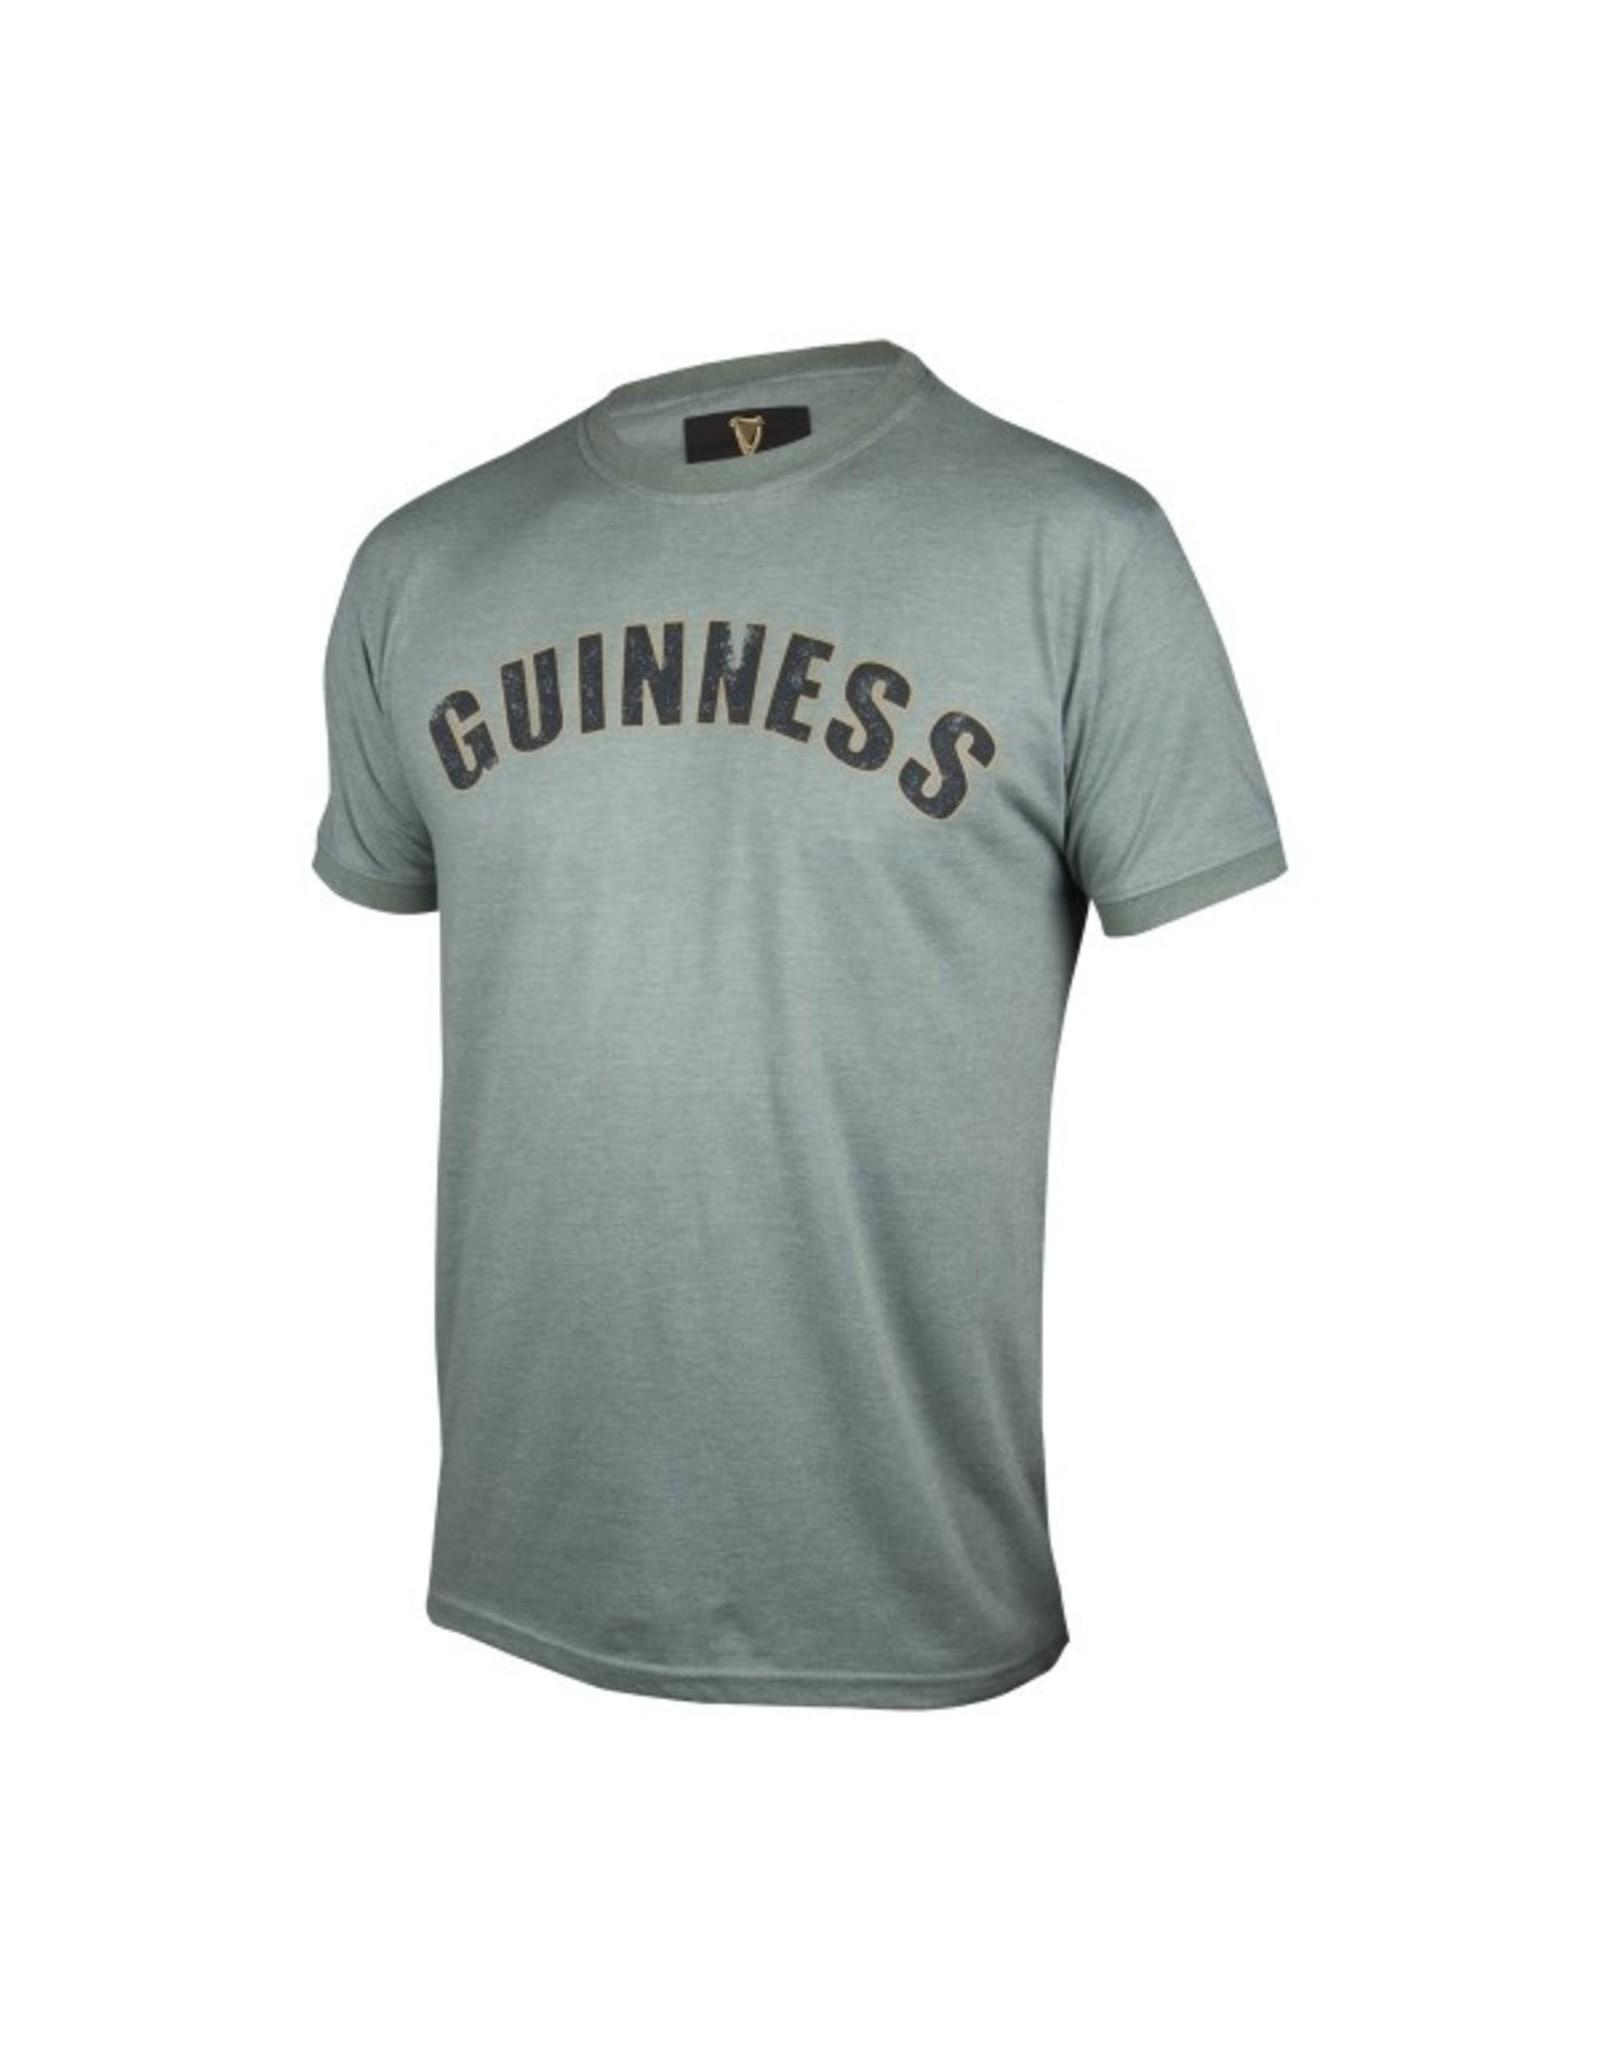 Guinness Guinness Green Heathered Bottle Cap T-shirt